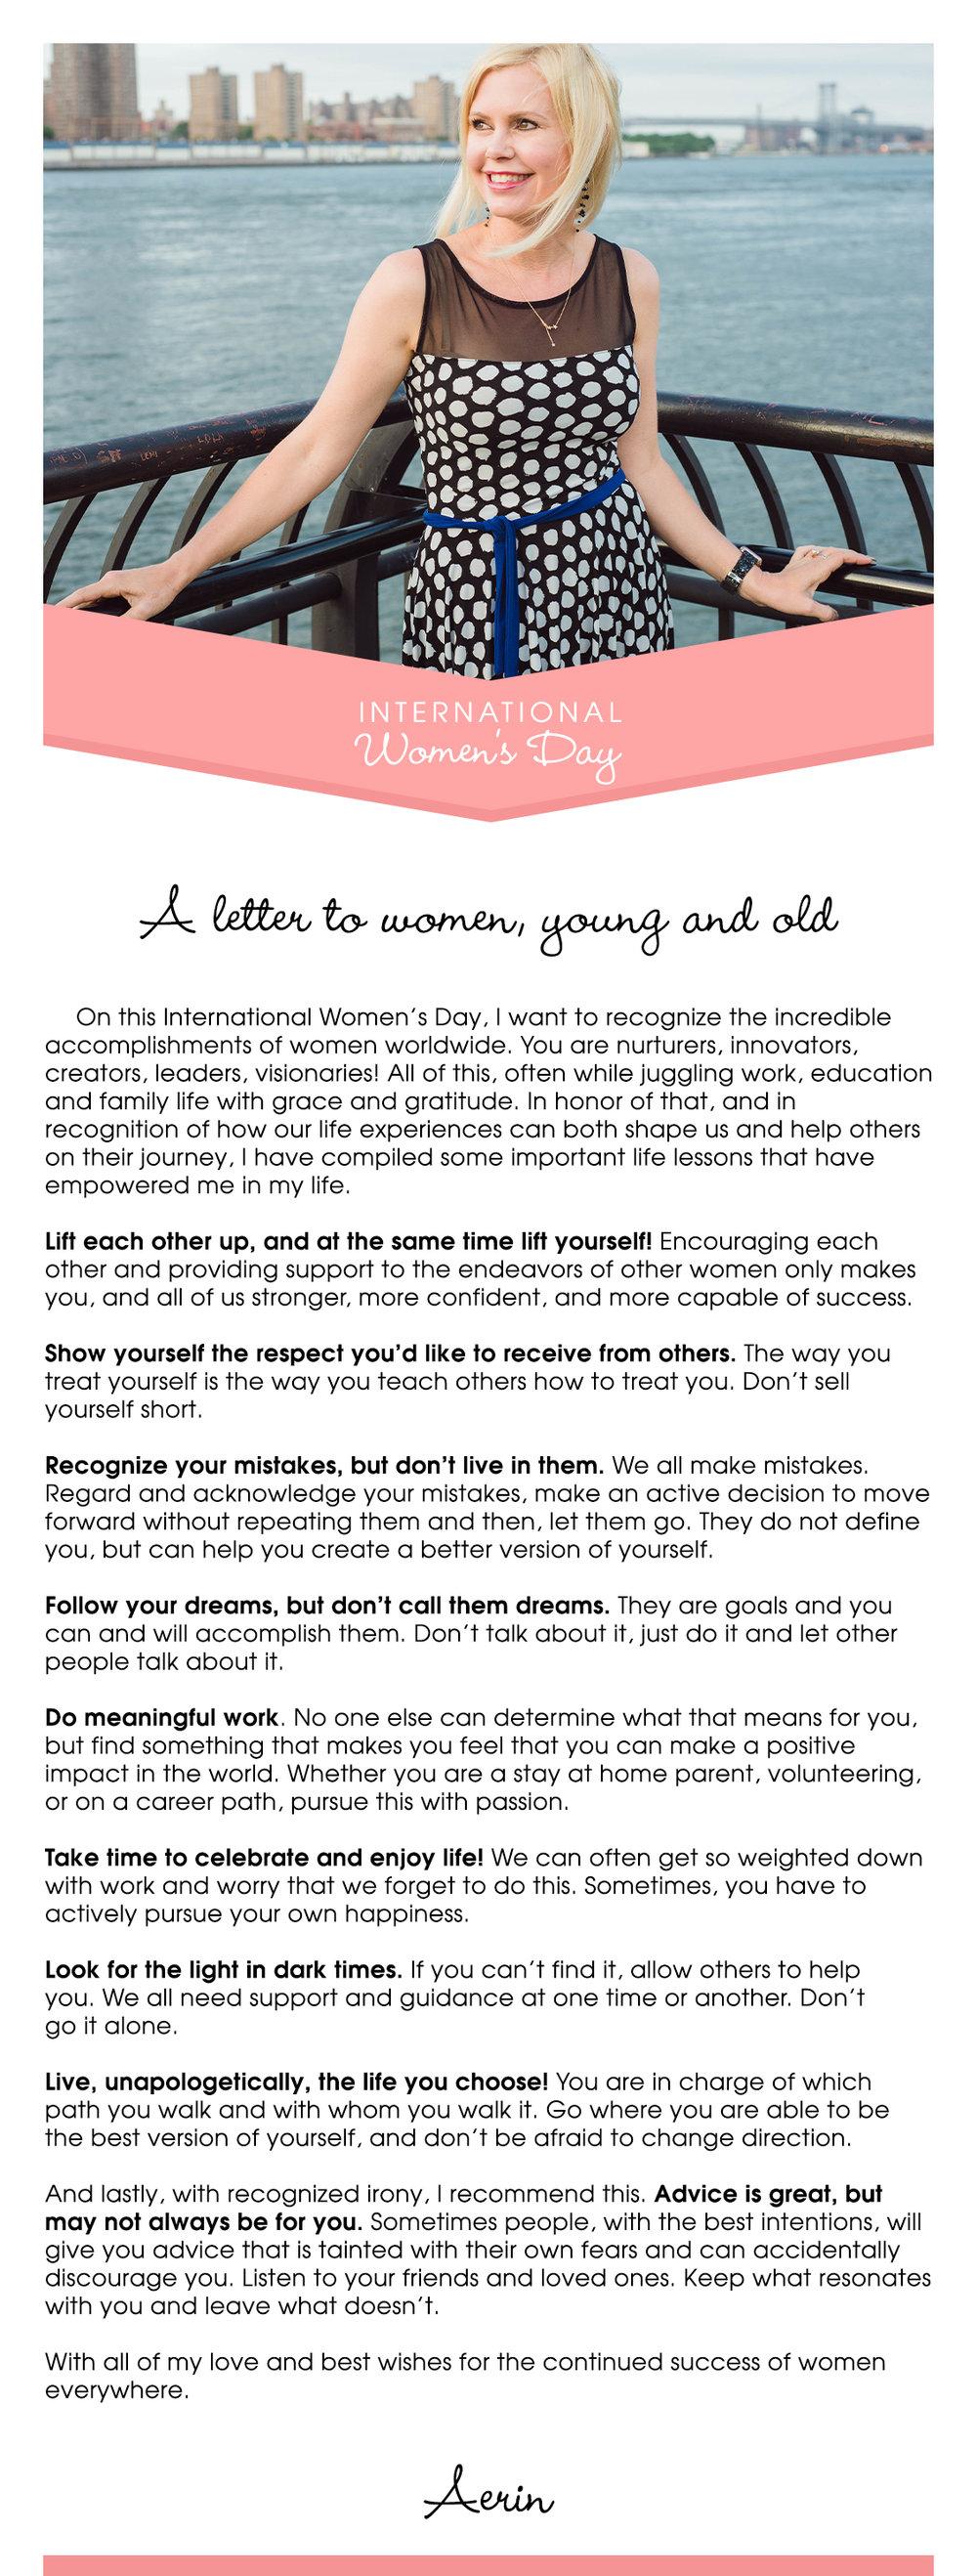 IntWomensDay_Blog post.jpg